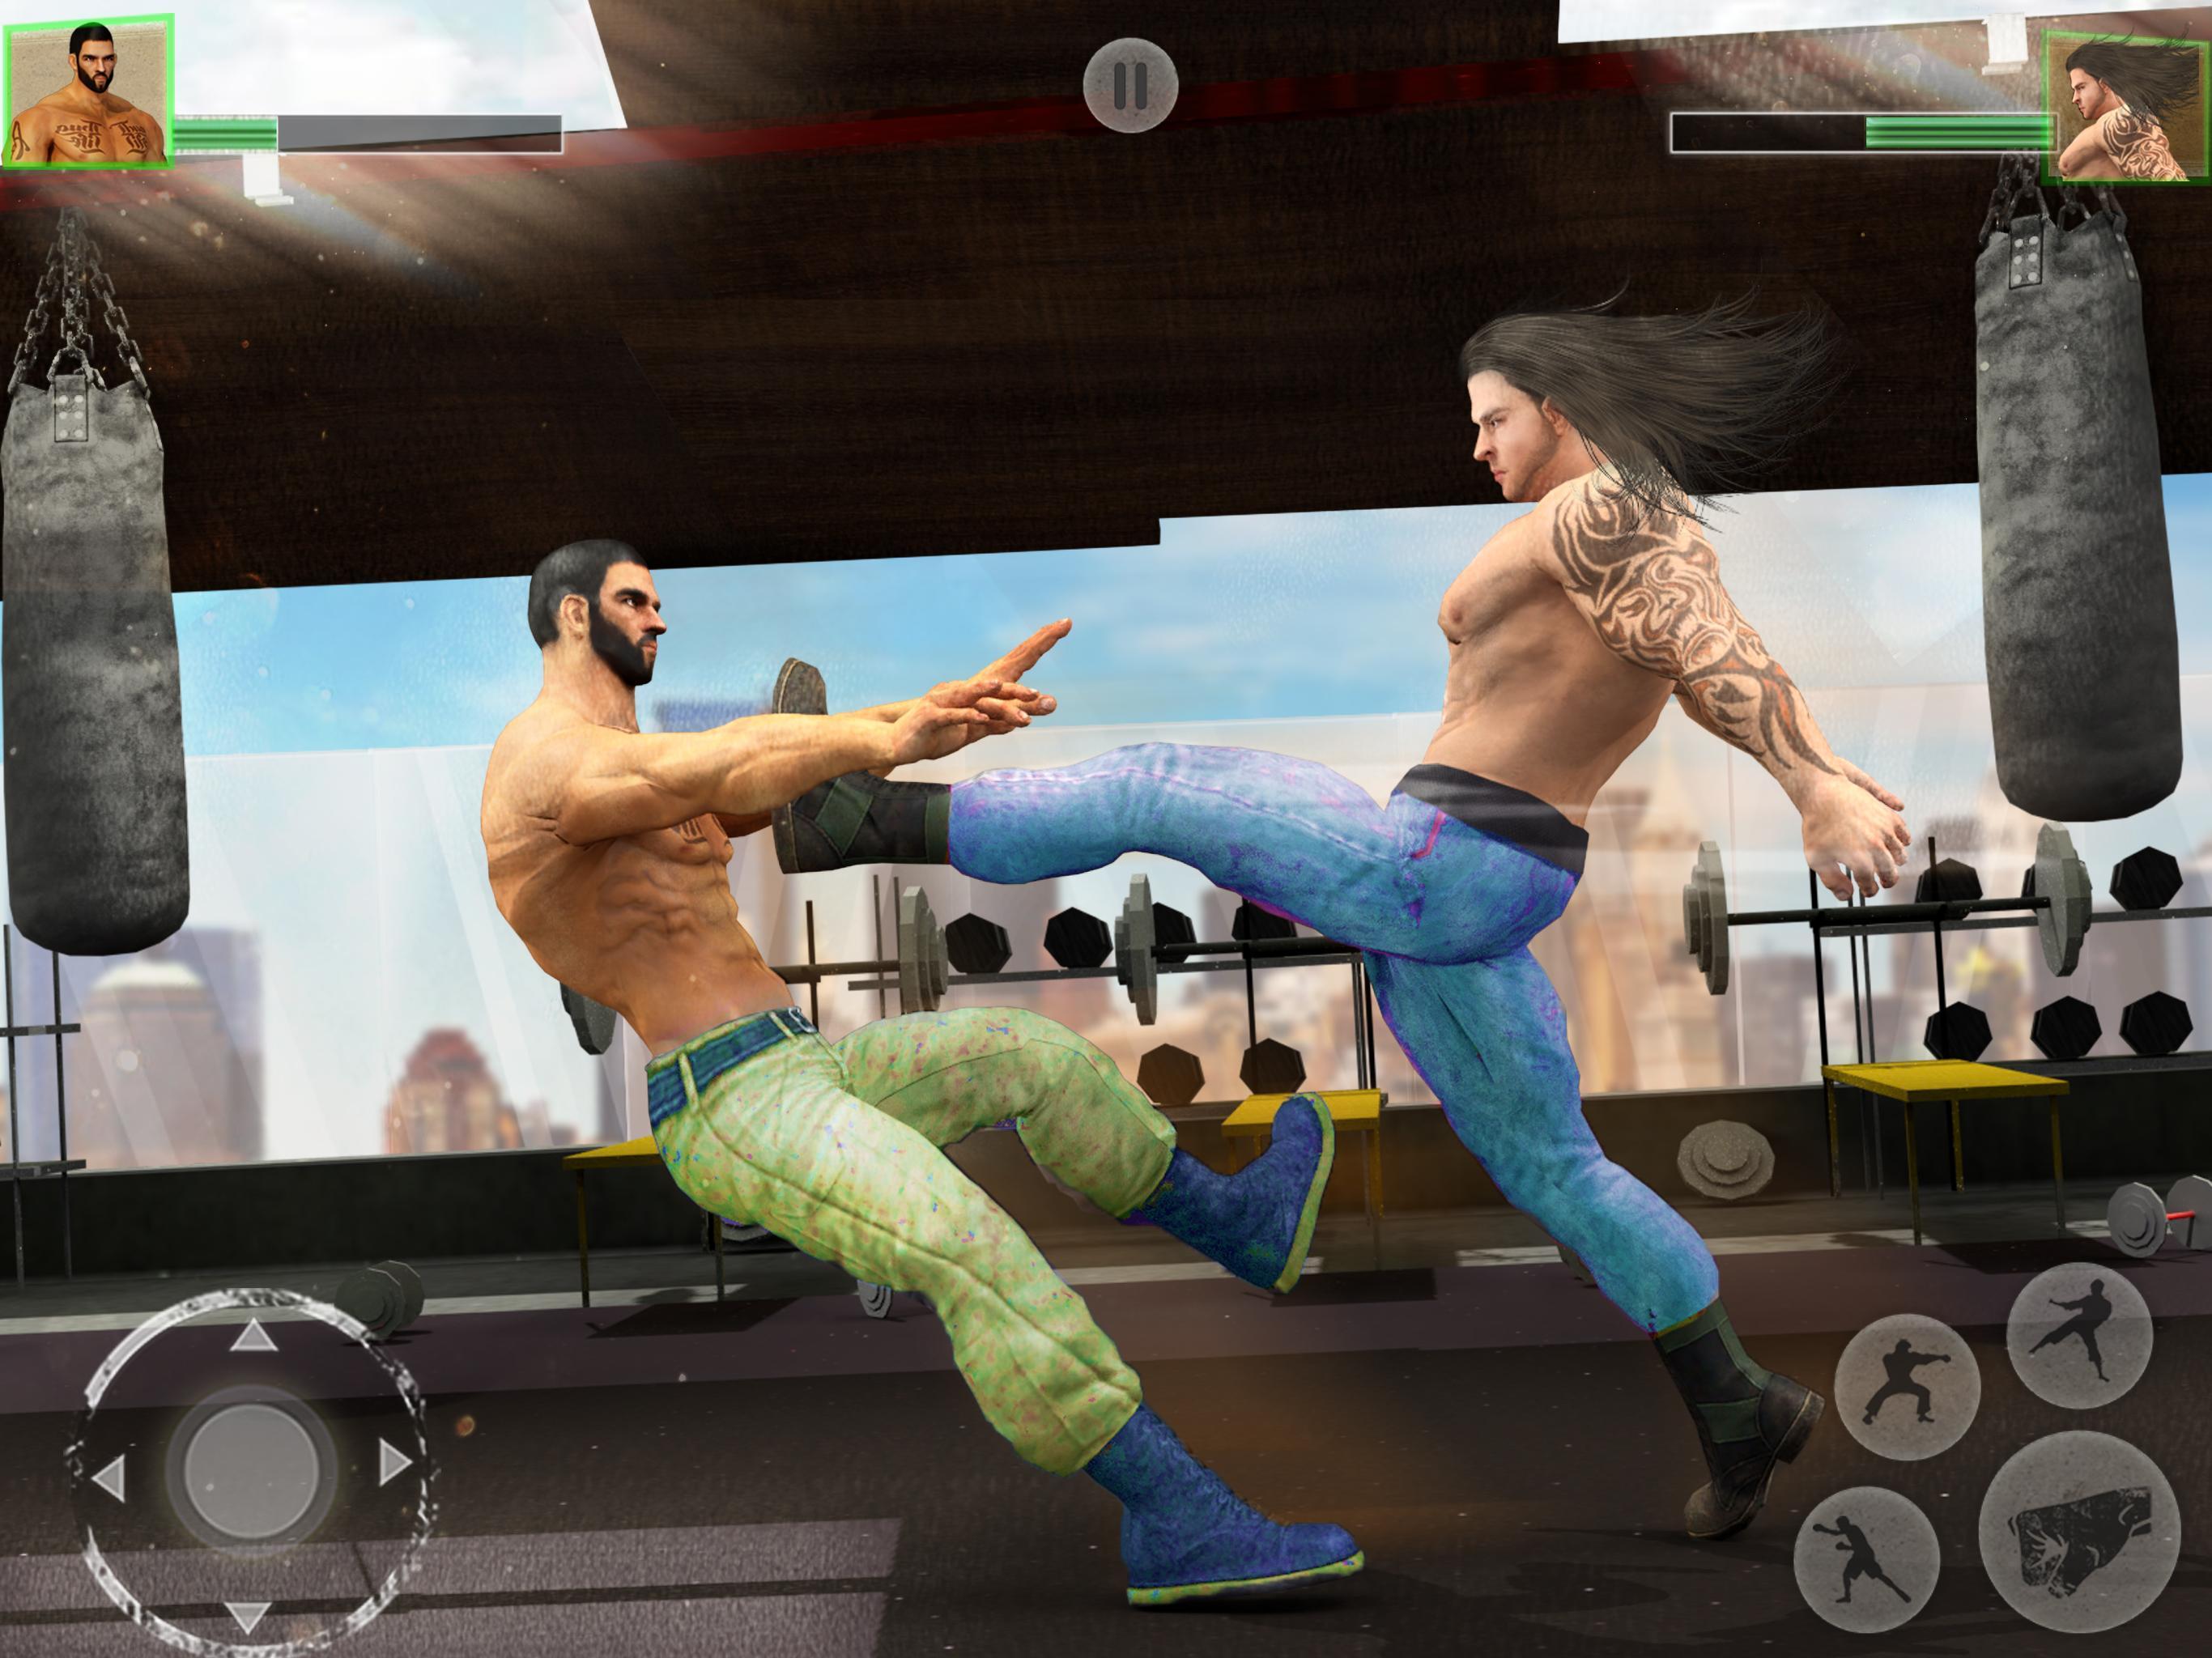 Bodybuilder Fighting Club 2019: Wrestling Games 1.1.4 Screenshot 5